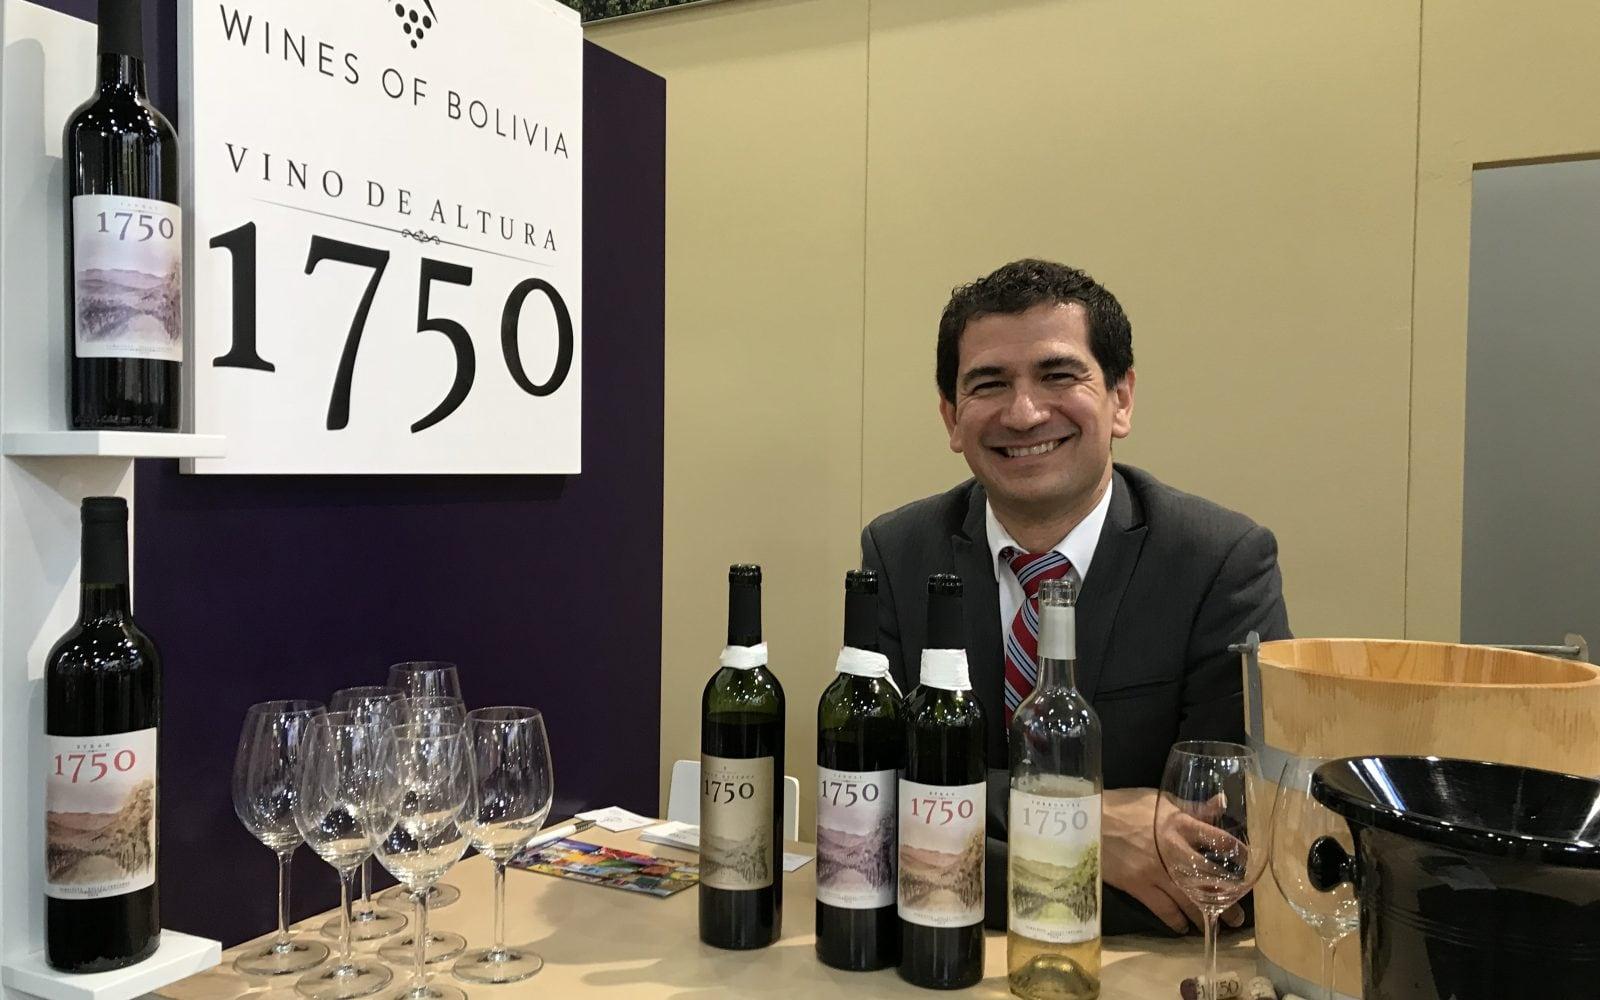 Fransisco Roig , vigneron bolivie